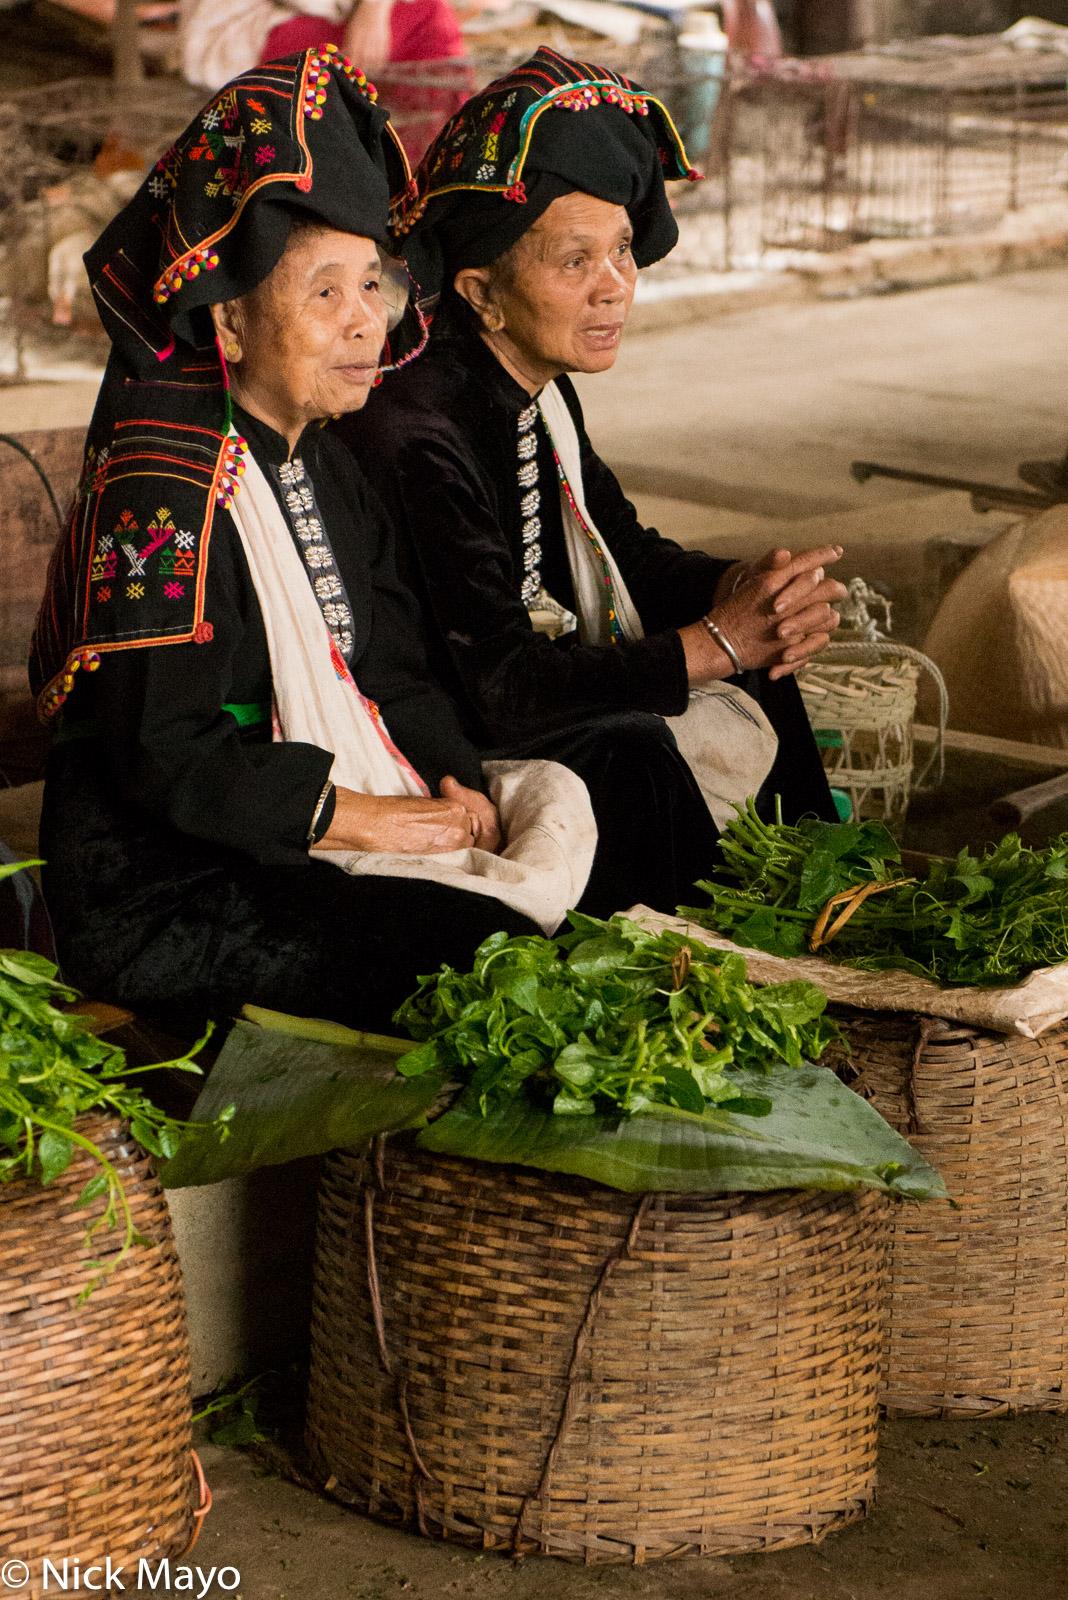 Dai, Headdress, Market, Selling, Son La, Vietnam, photo